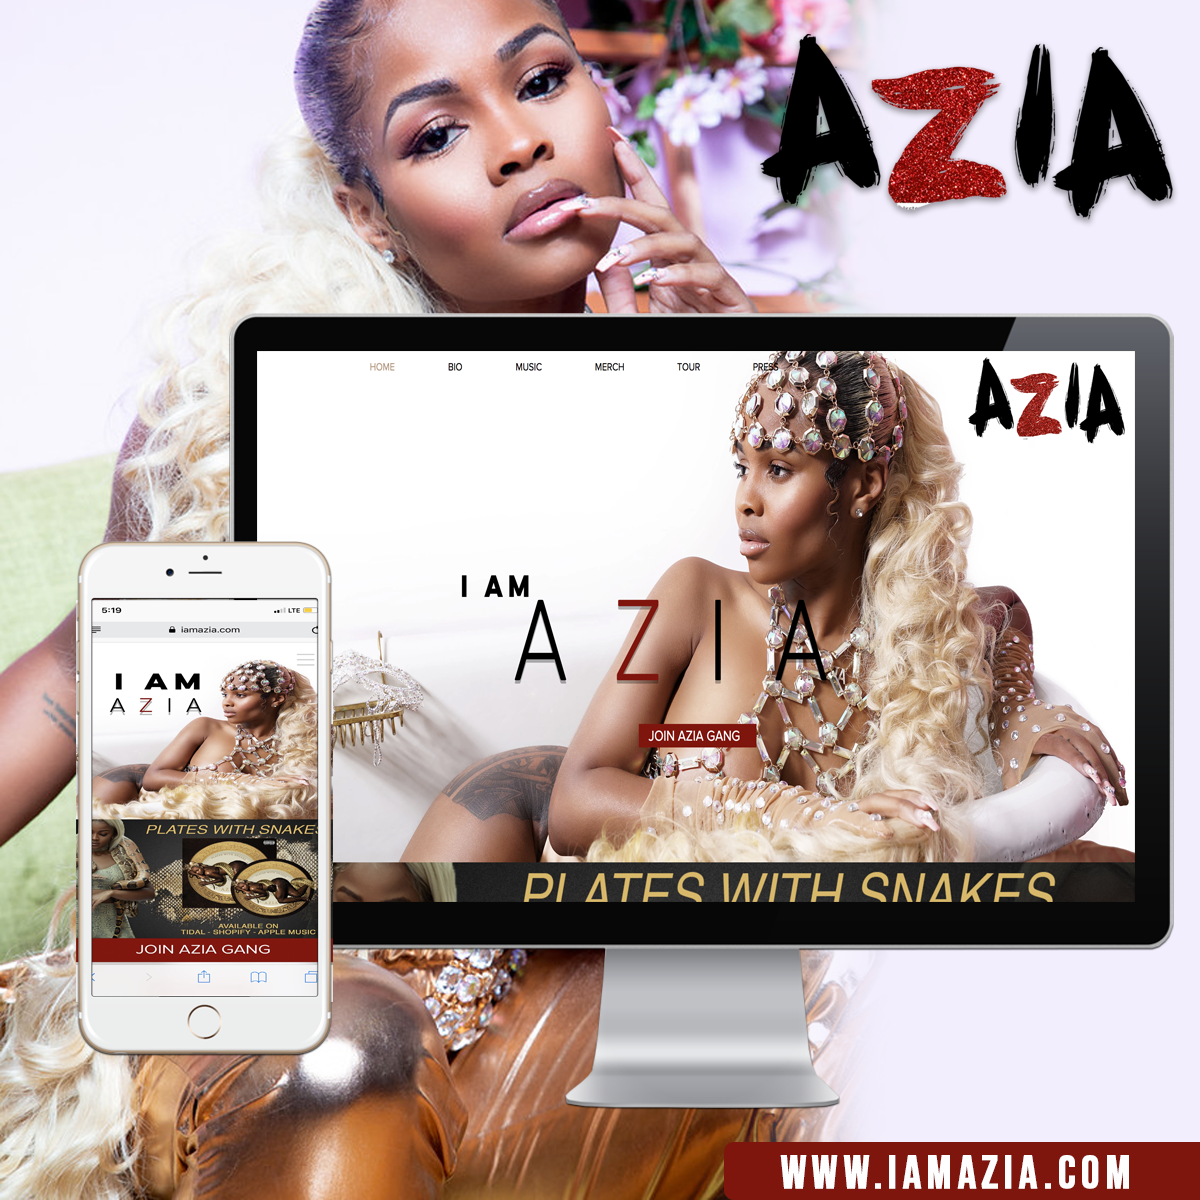 aziawebsite